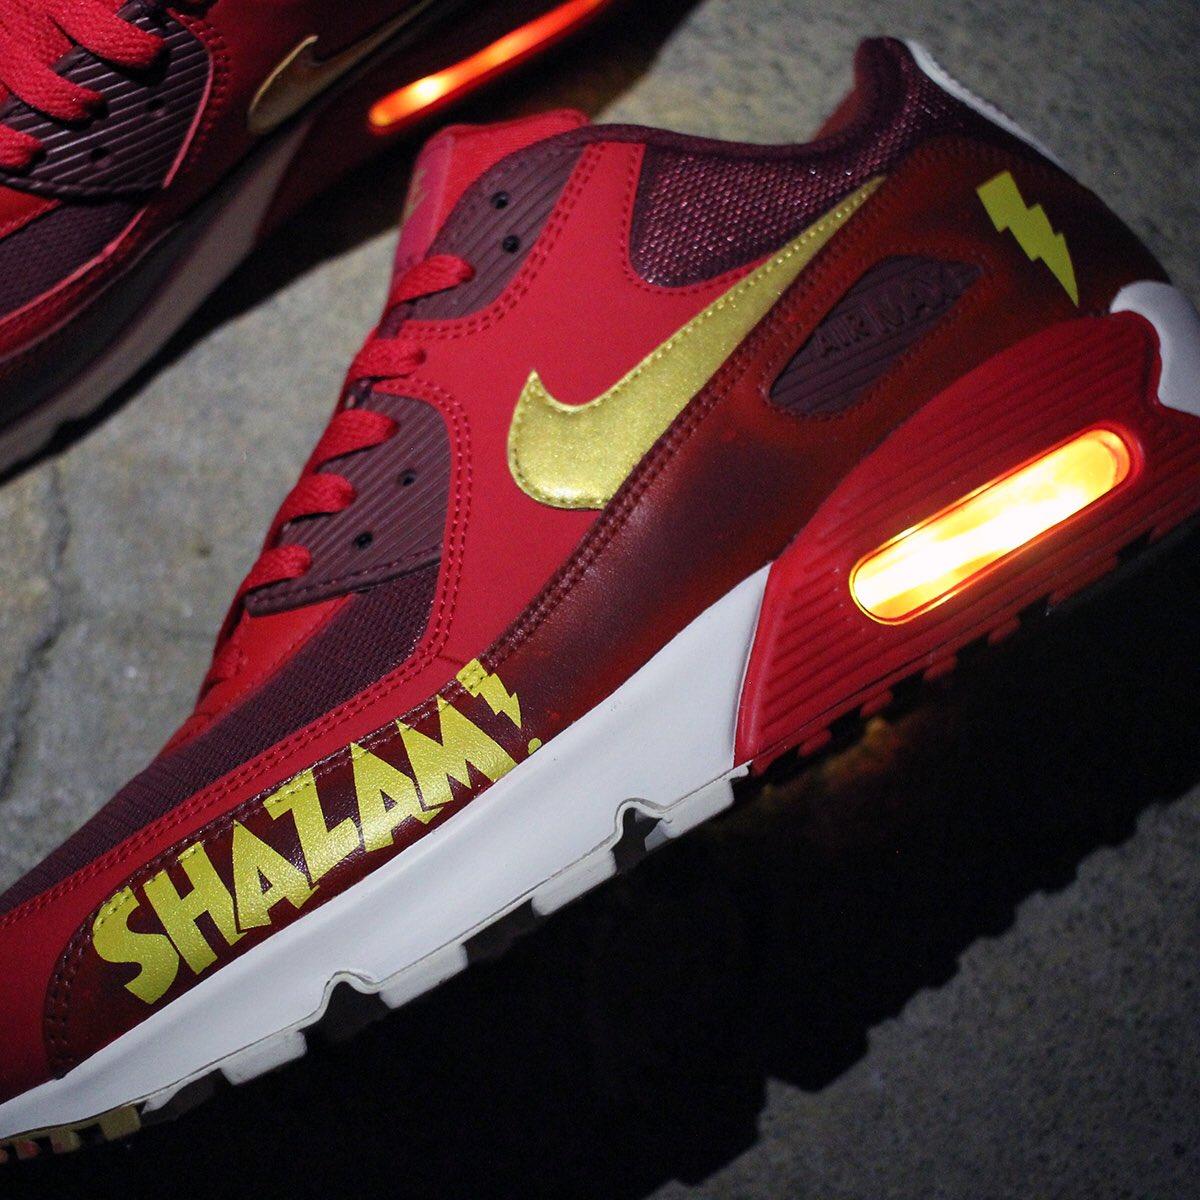 evolved footwear light up shoes evolvedfootwear twitter